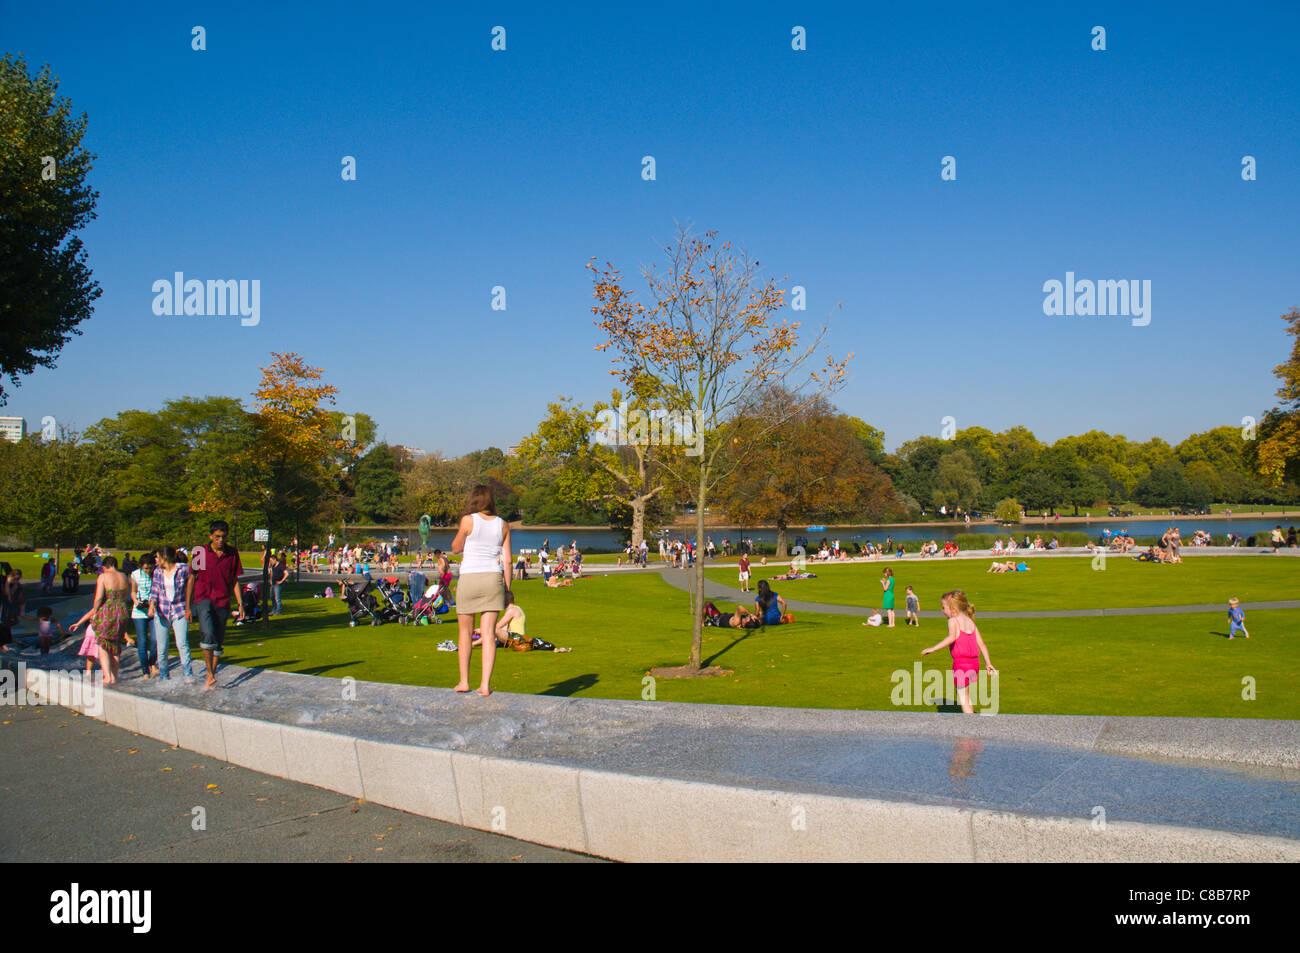 Princess Diana Memorial Fountain in Hyde Park central London England UK Europe - Stock Image